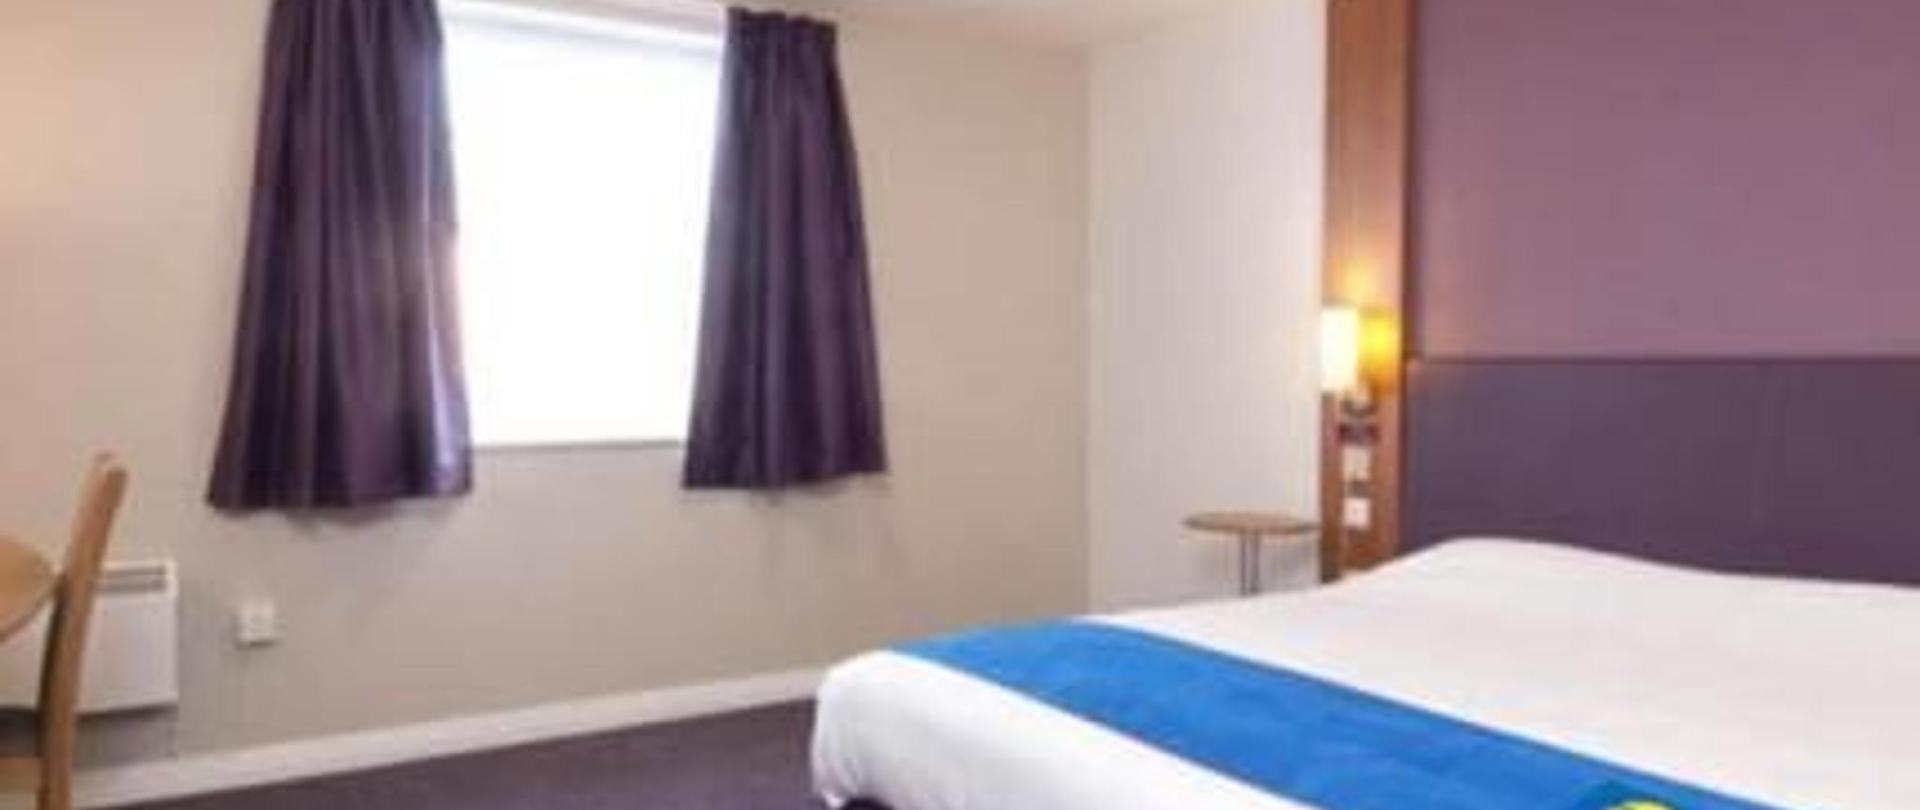 comfort-inn-manchester-north-manchester-2810201319473027571.jpg